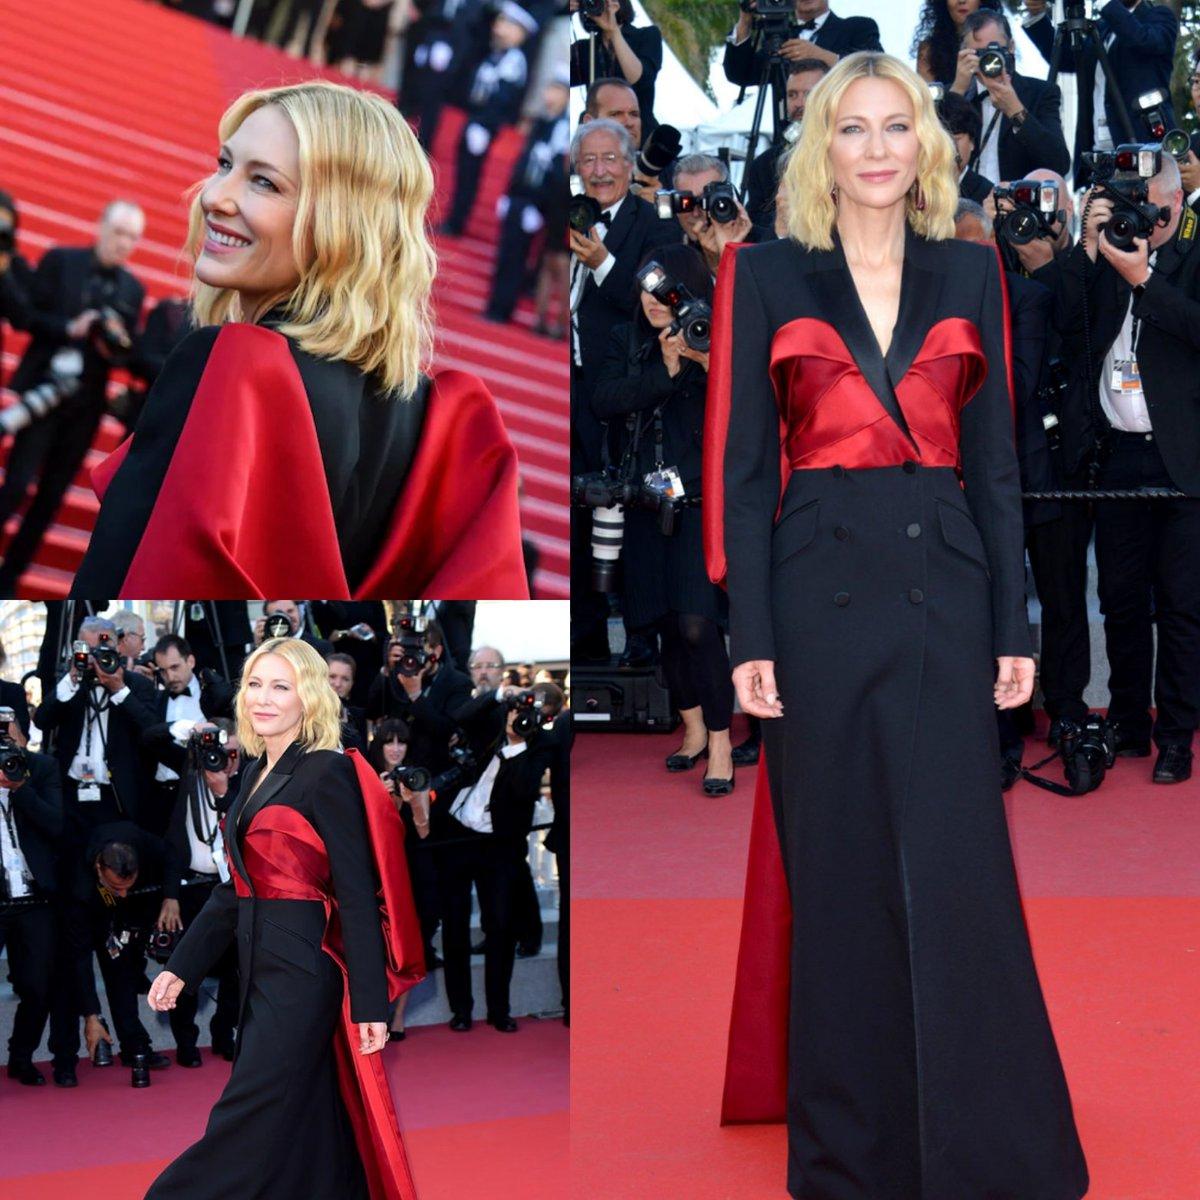 Cate Blanchett, Madame President,  moment of appreciation  @Festival_Cannes 2018 #cateblanchett #cannes2018